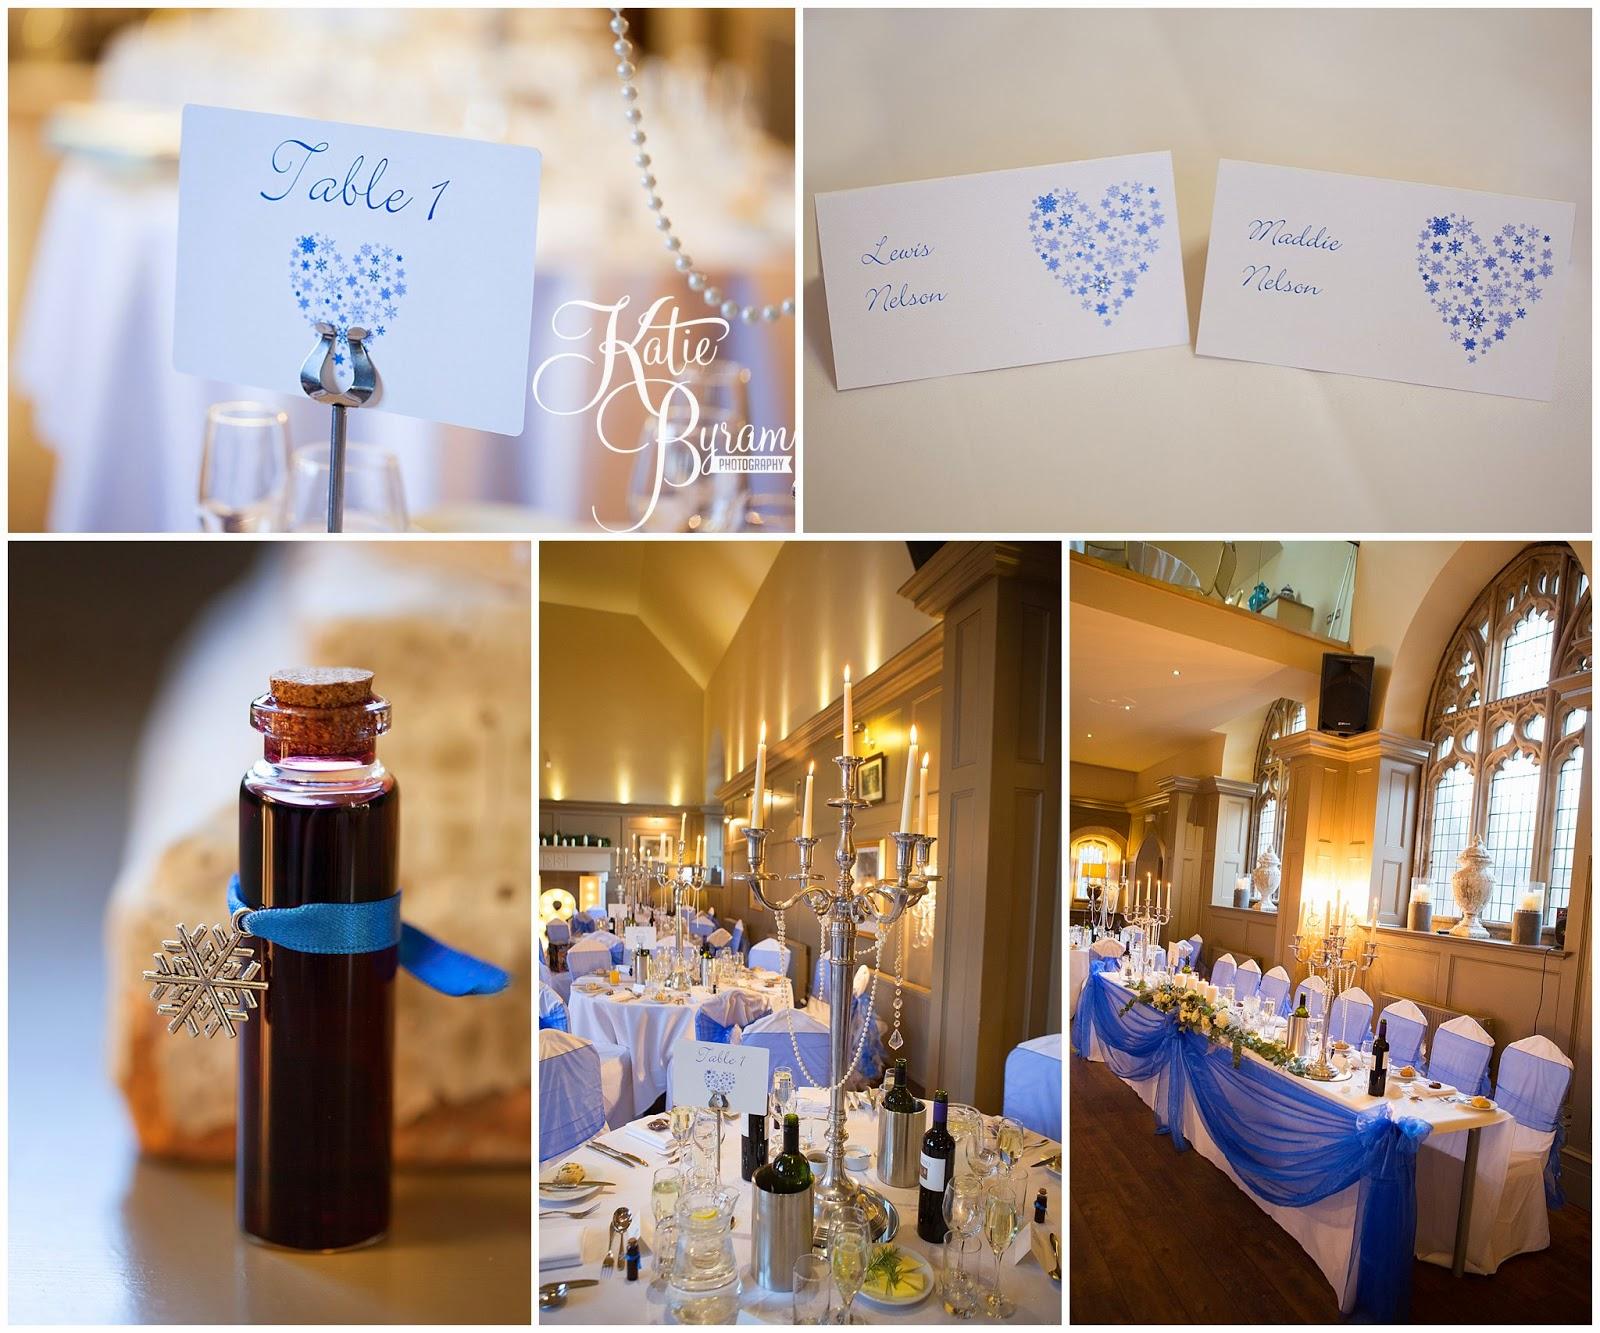 chapel at ellingham hall, ,  ellingham hall, ellingham hall wedding, katie byram photography, alnwick treehouse wedding, alnwick garden wedding, alnwick wedding,